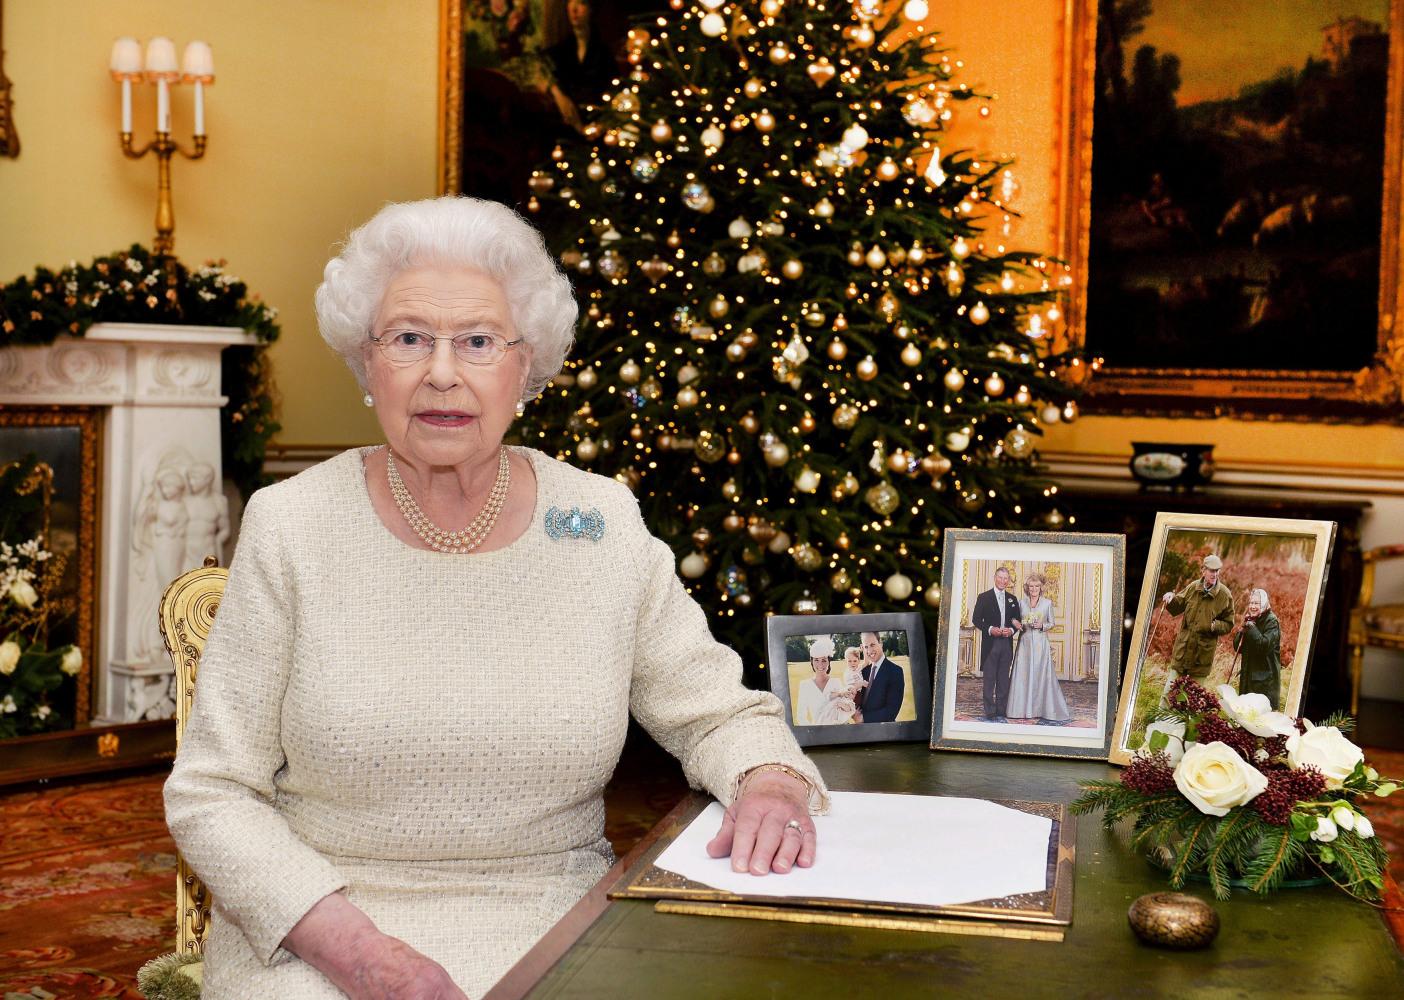 Queen Elizabeth II's message: Light can triumph